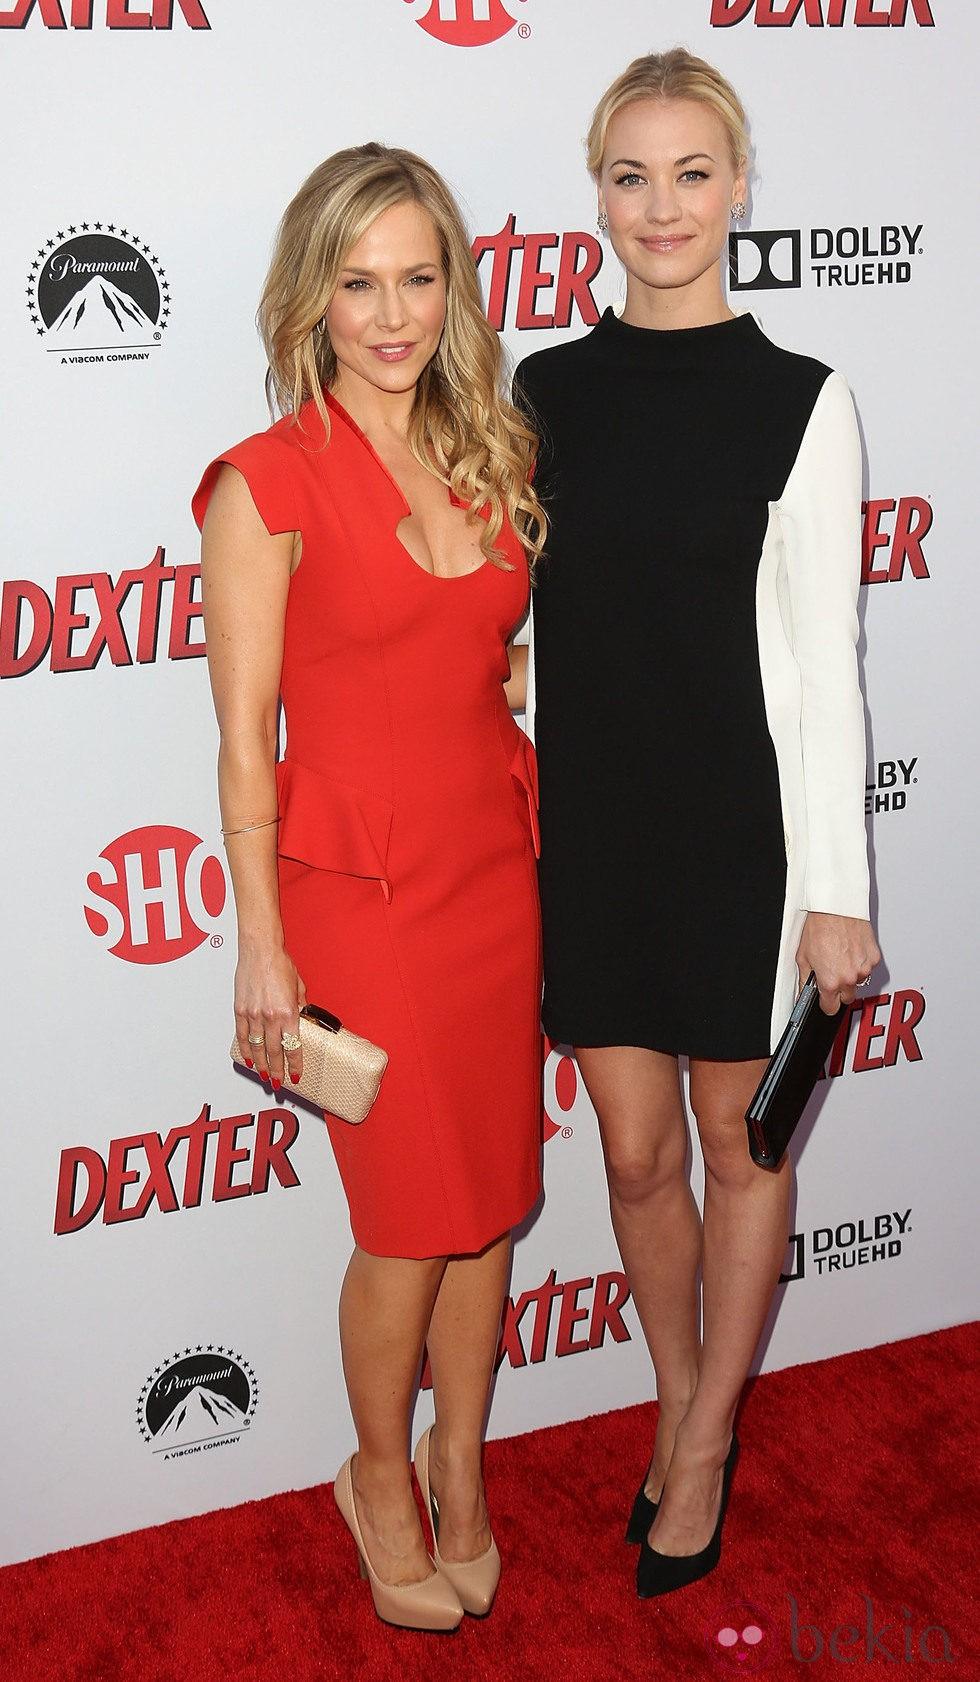 ¿Cuánto mide Julie Benz? - Real height 42843_julie-benz-yvonne-strahovski-presentacion-8-temporada-serie-dexter